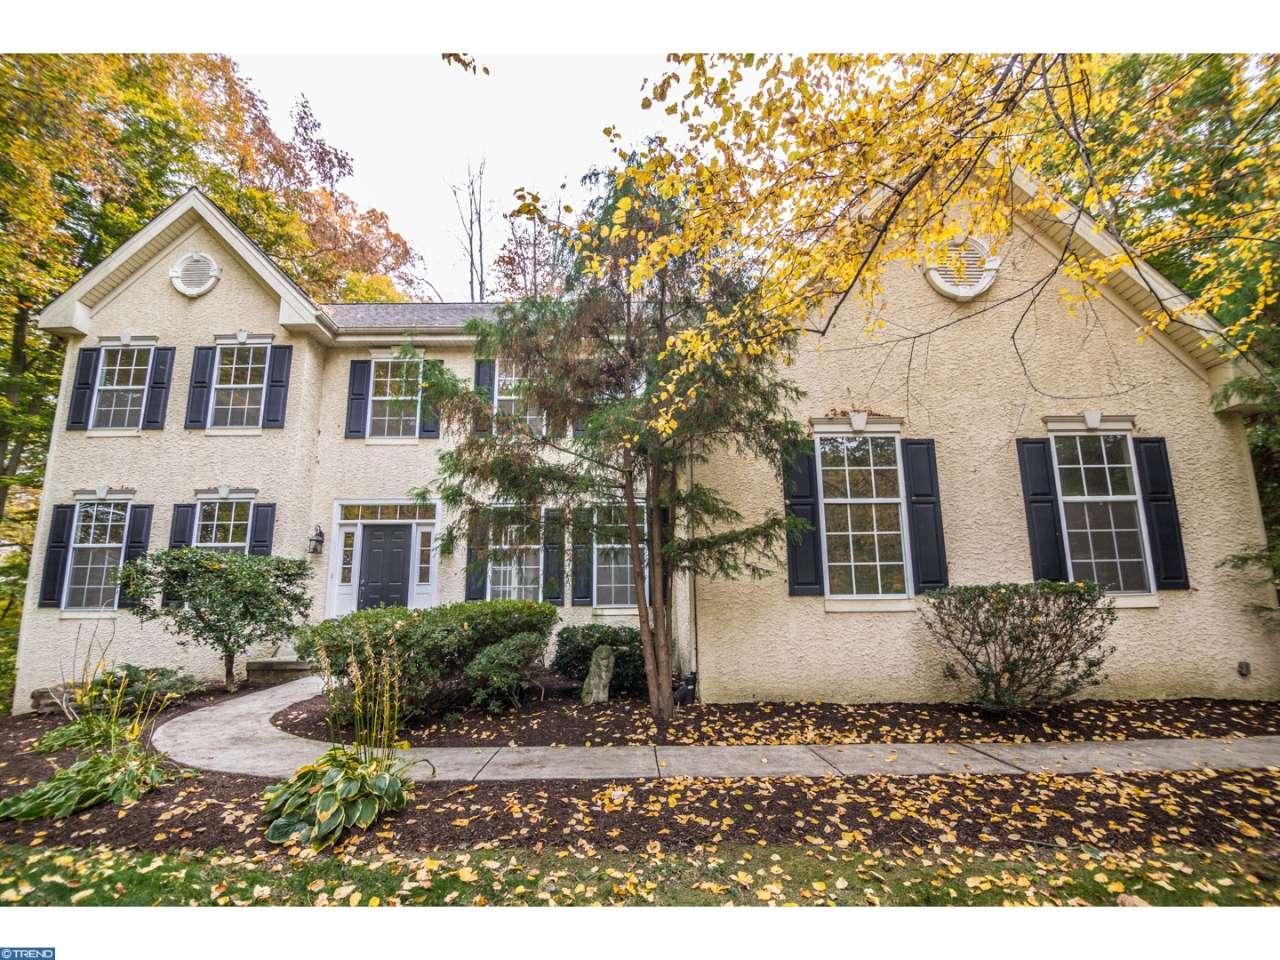 Property for sale at 384 EGYPT RUN RD, Landenberg,  PA 19350